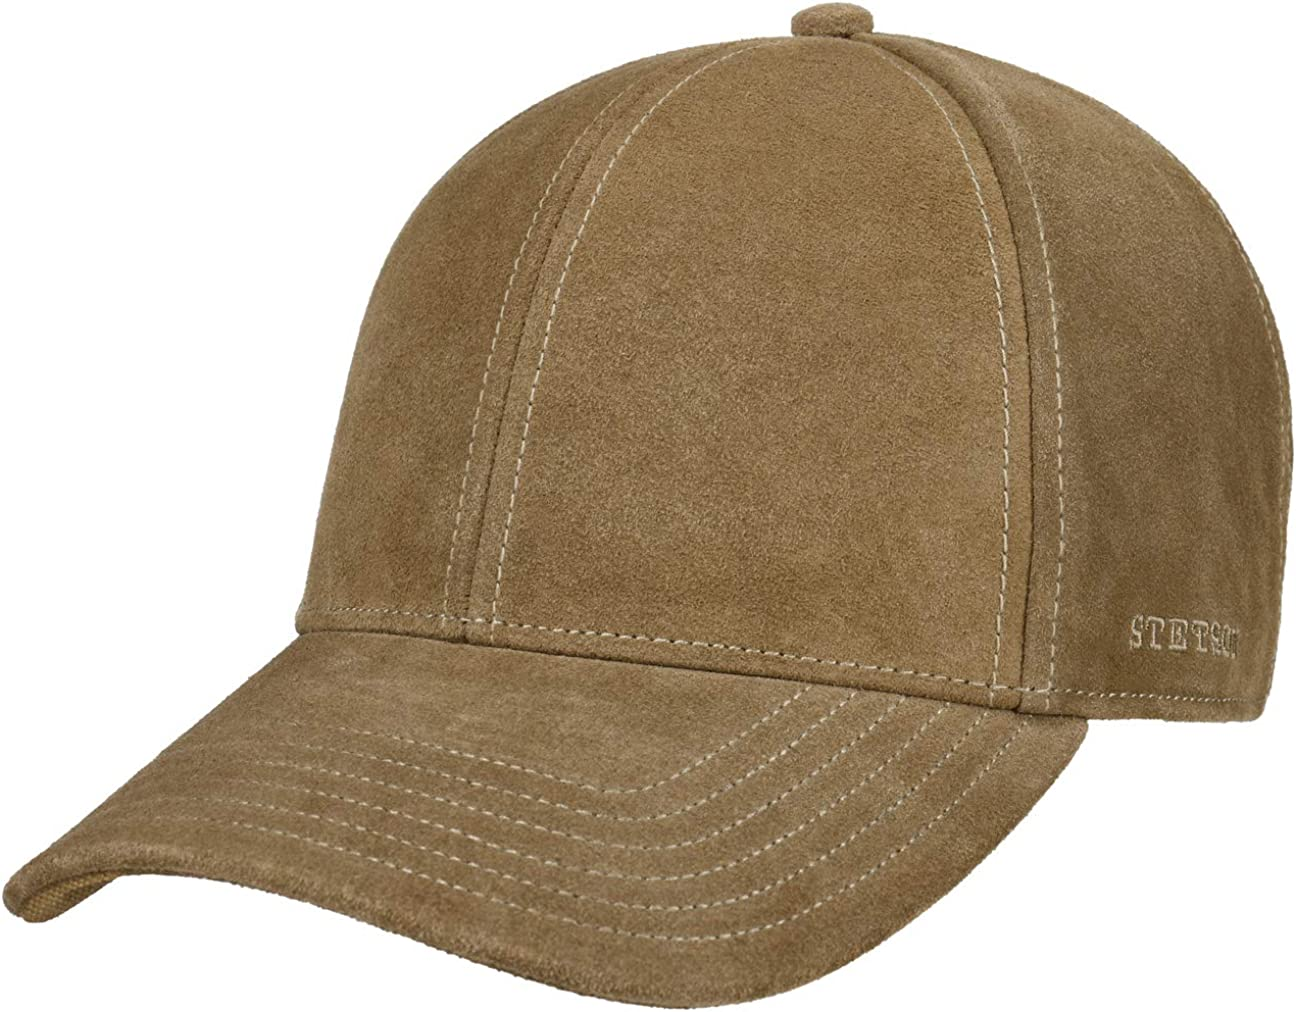 Stetson Men's Calf Leather Baseball Cap Brown